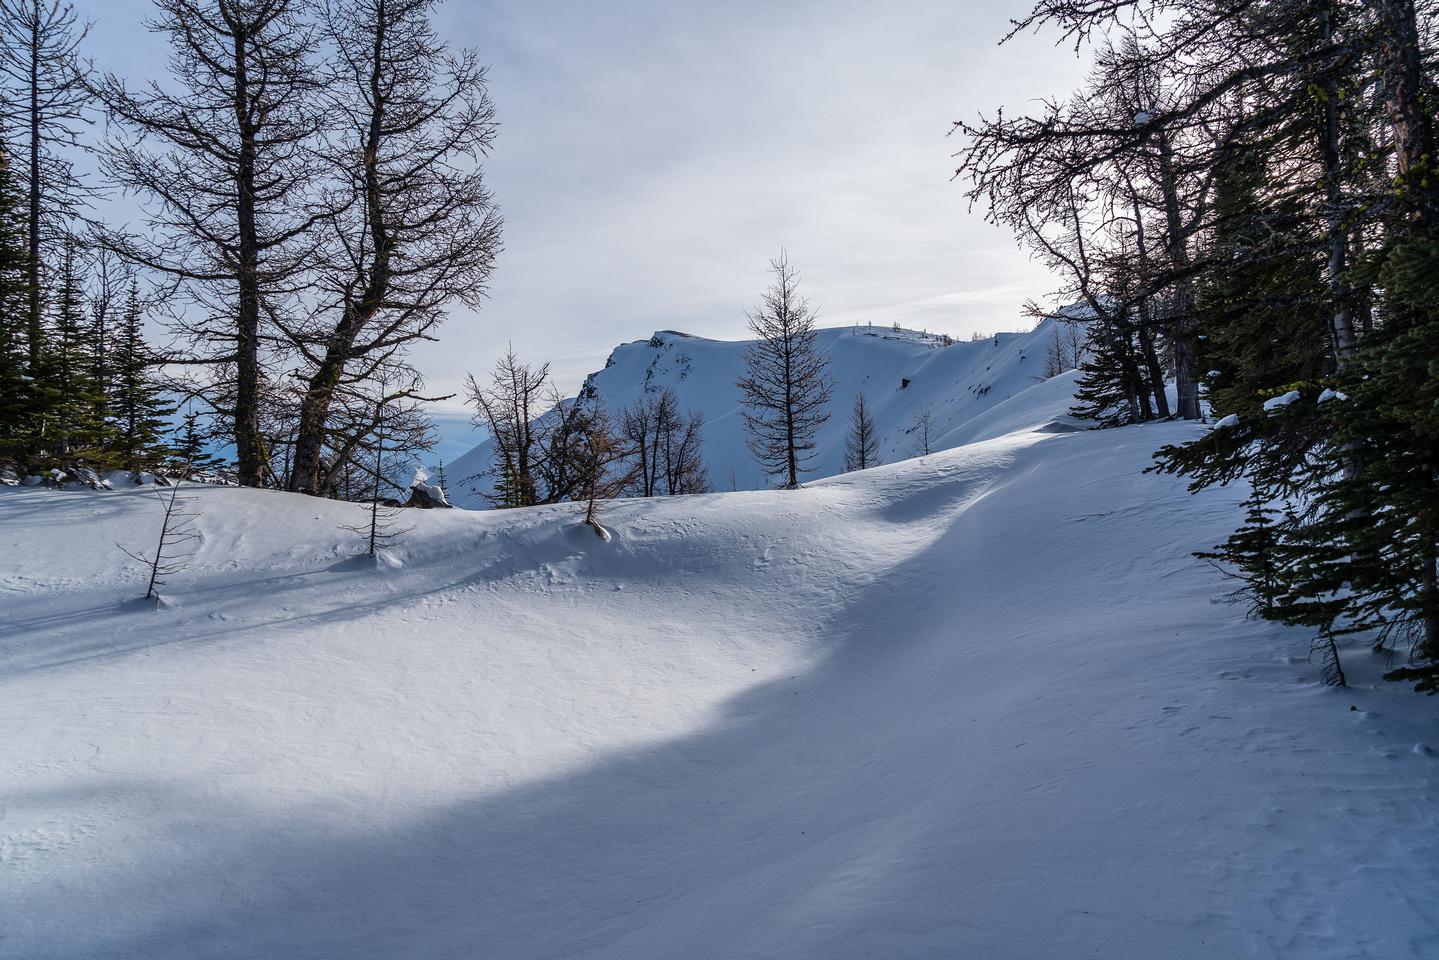 Skiing through larches on the north ridge.